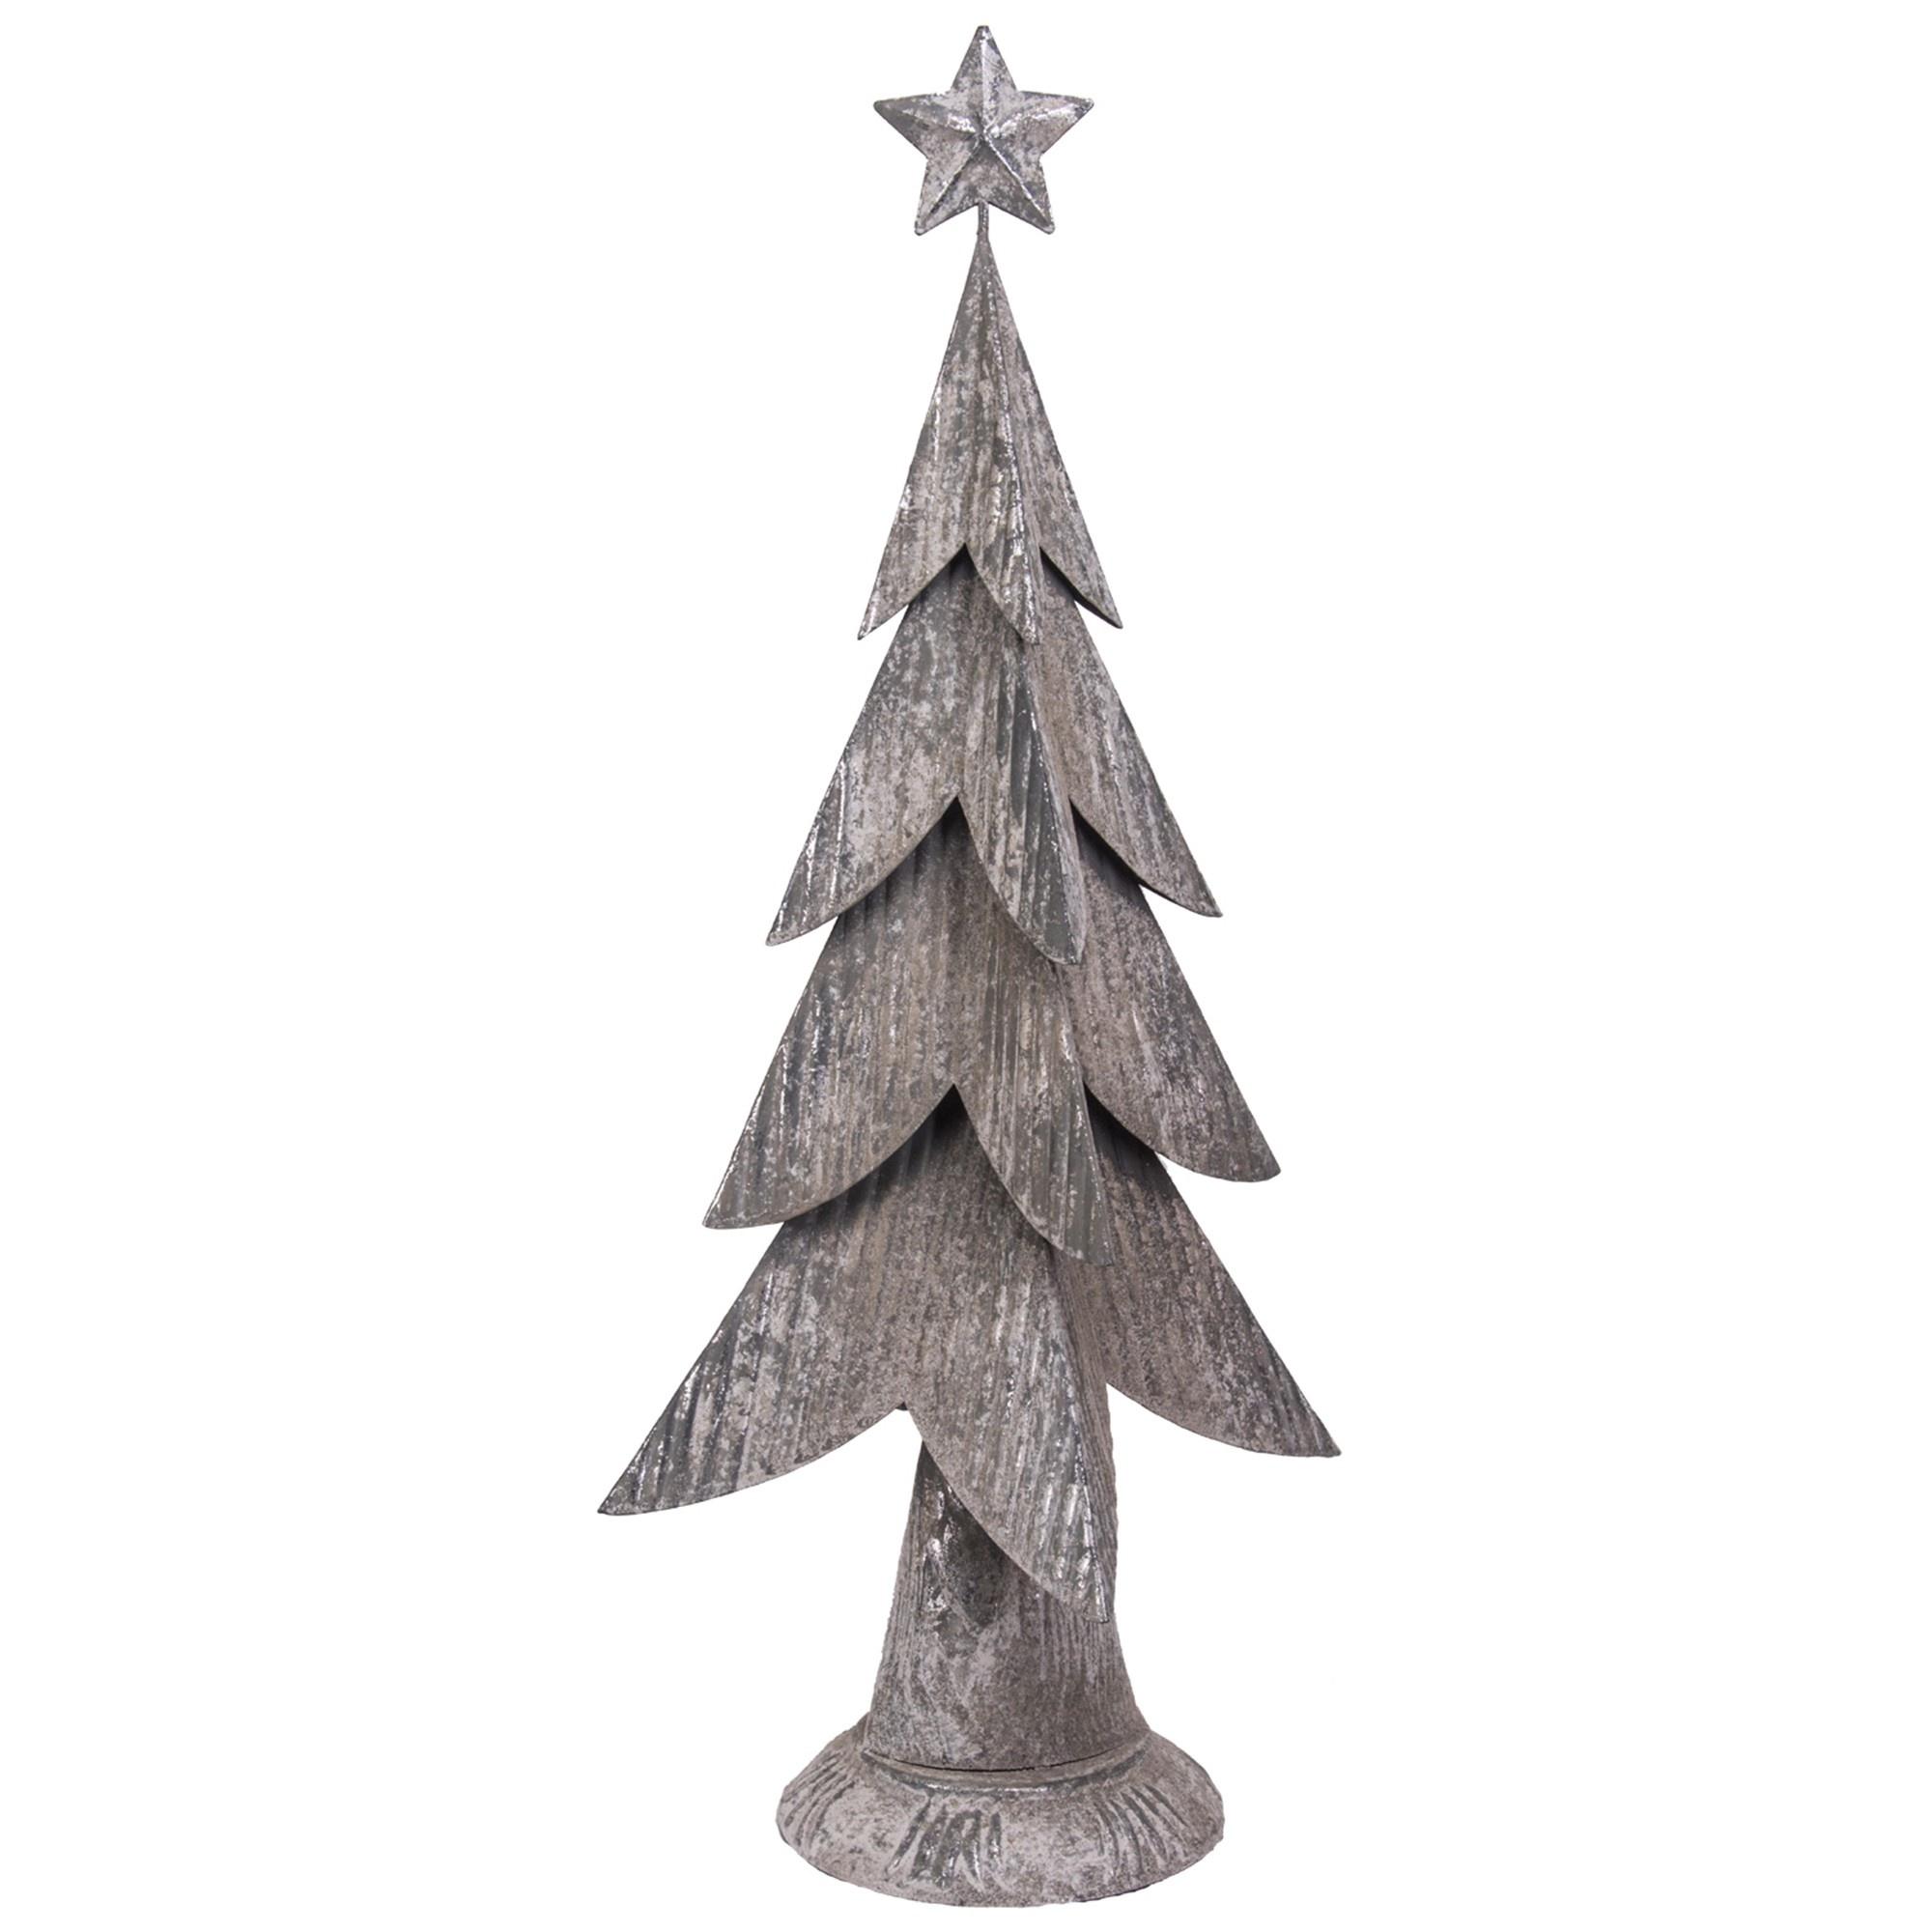 Distressed Metal Christmas Tree